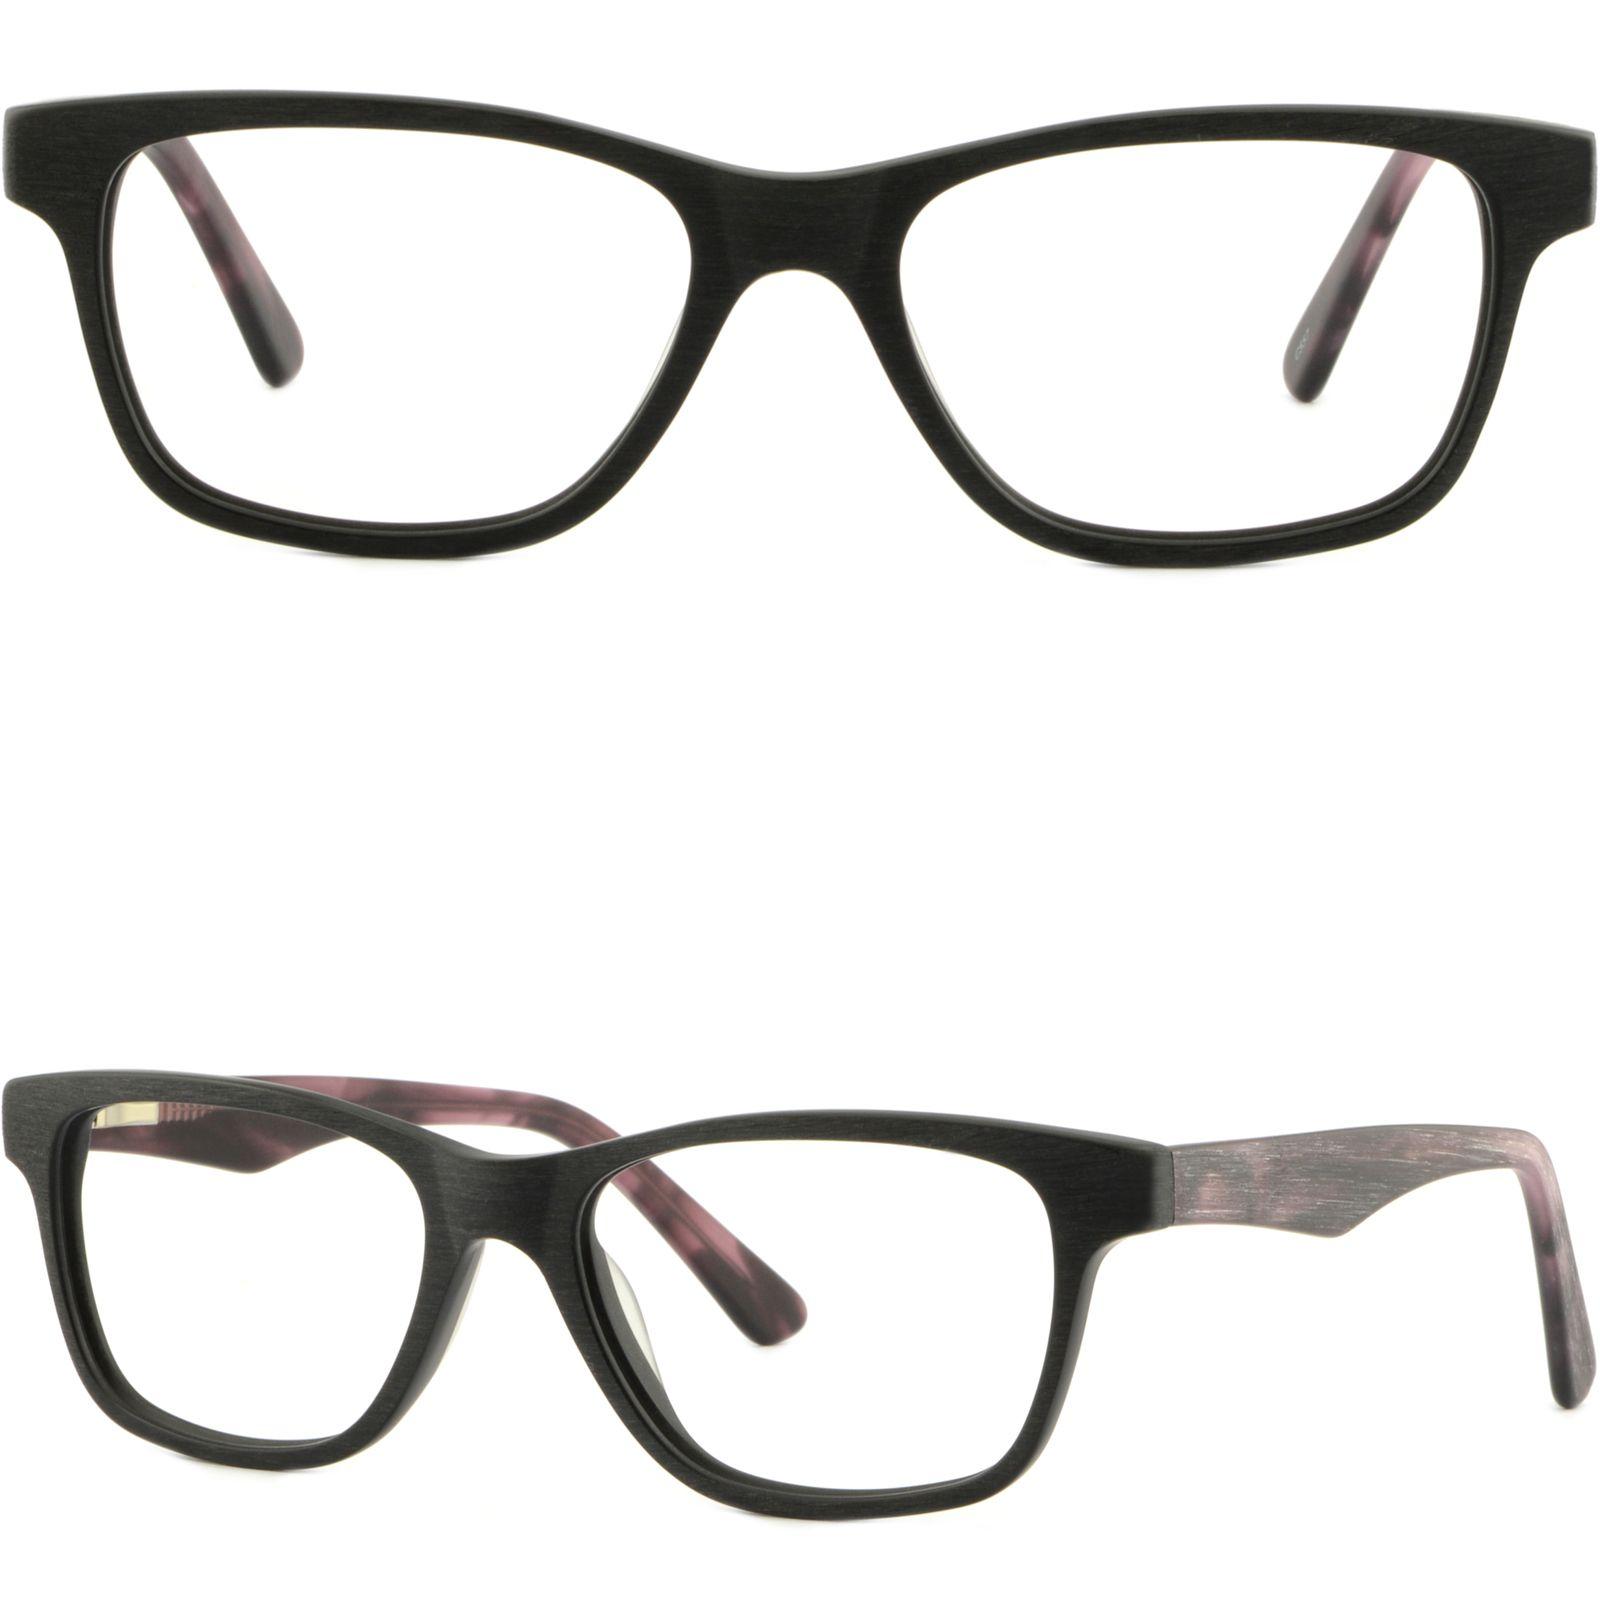 d897abf1805 Square Mens Womens Acetate Frame Spring Loaded Hinges Prescription Glasses  Black Glasses Frame Online with  22.8 Piece on Aceglasses s Store